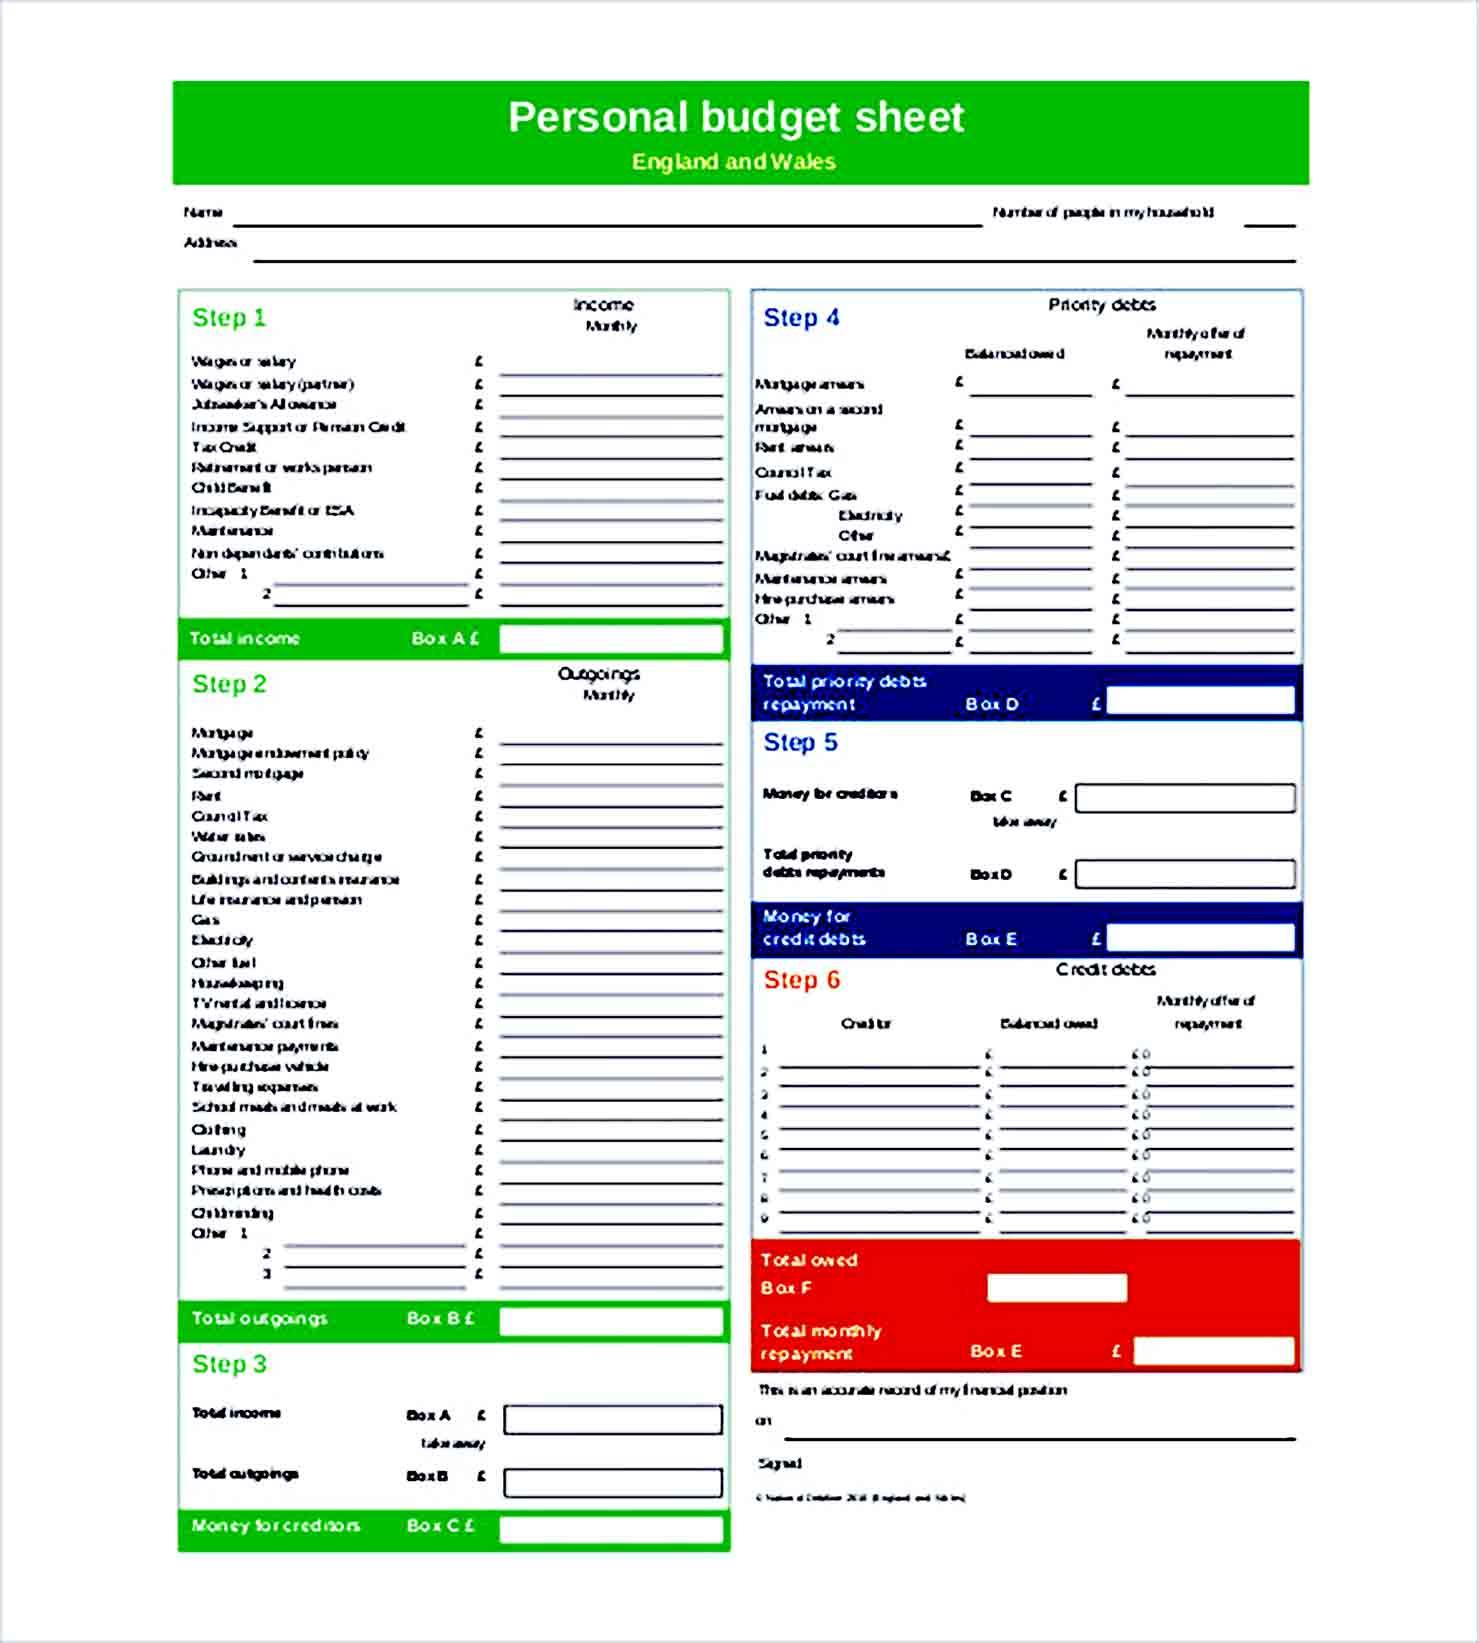 Sample personal budget sheet North Somerset Council